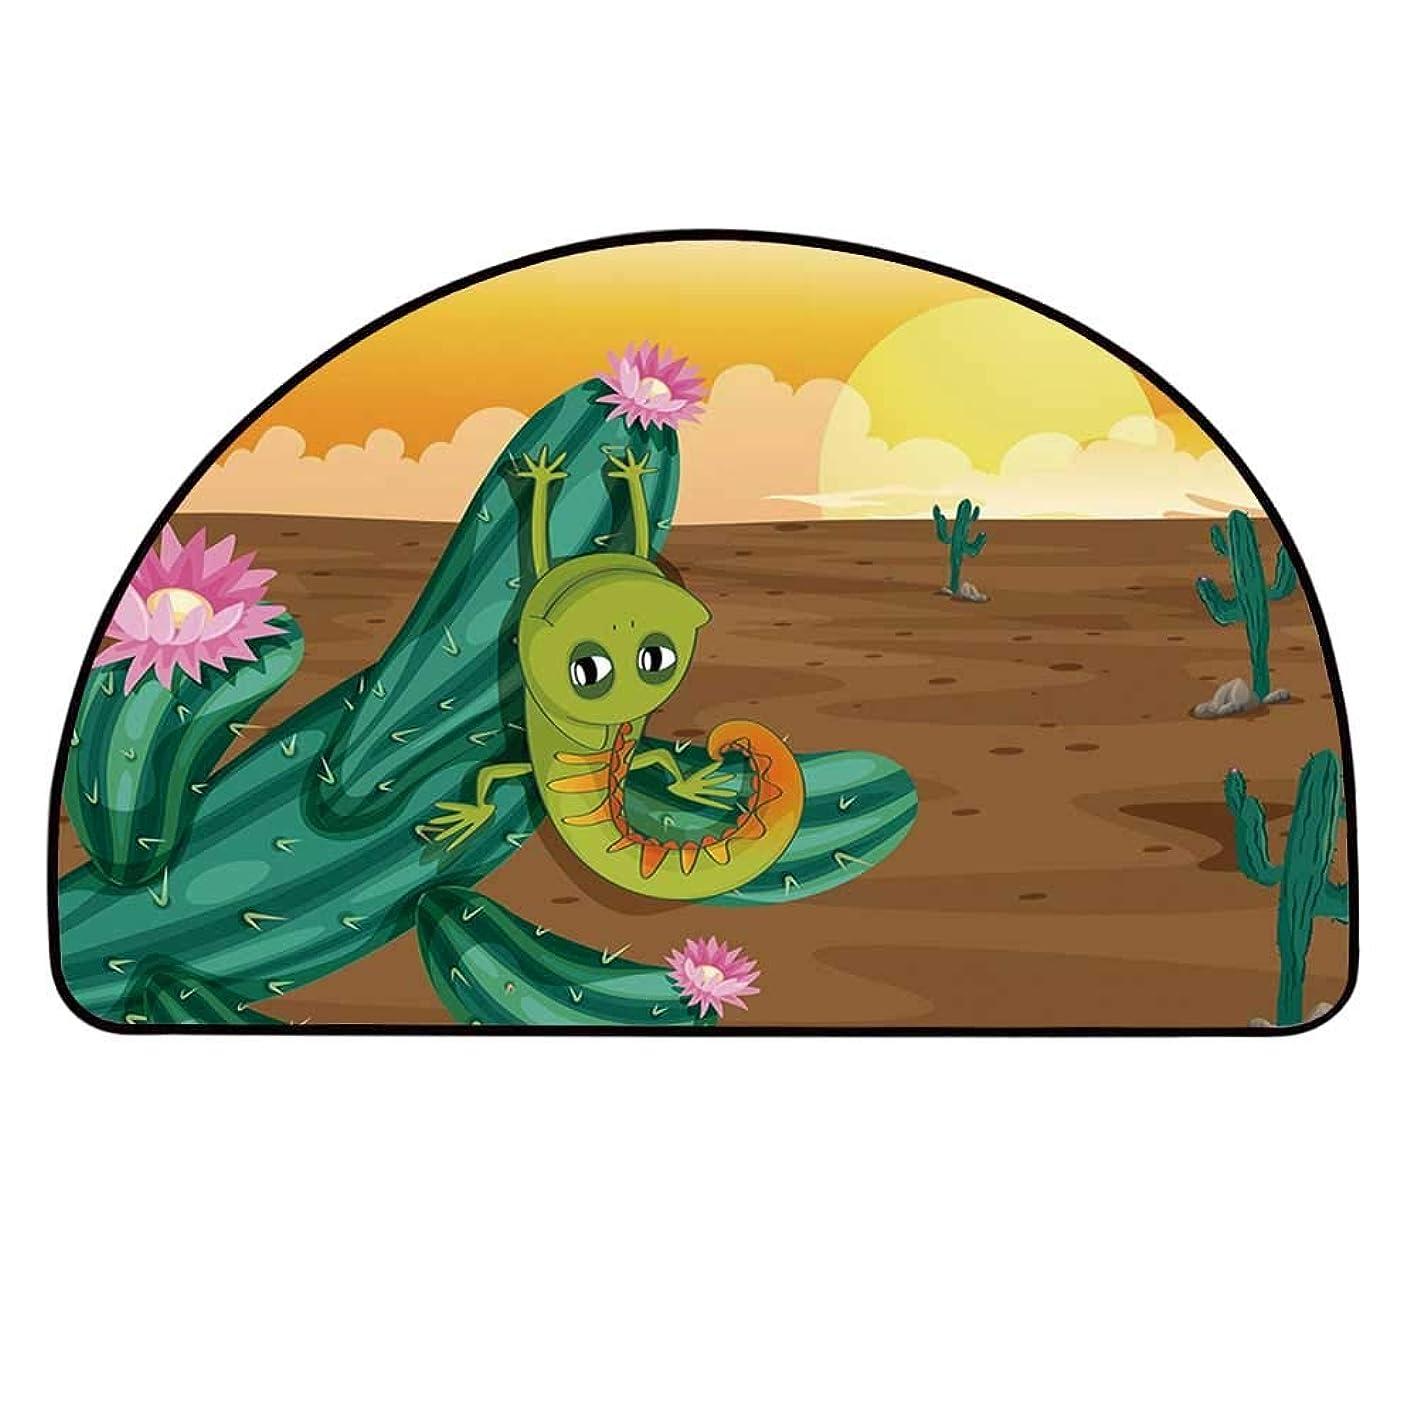 YOLIYANA Cactus Decor Semicircle Rug,Cartoon Style Desert Setting Sun Chameleon on Cactus Arid Country Barren Heath Decorative Floor Mat,37.4